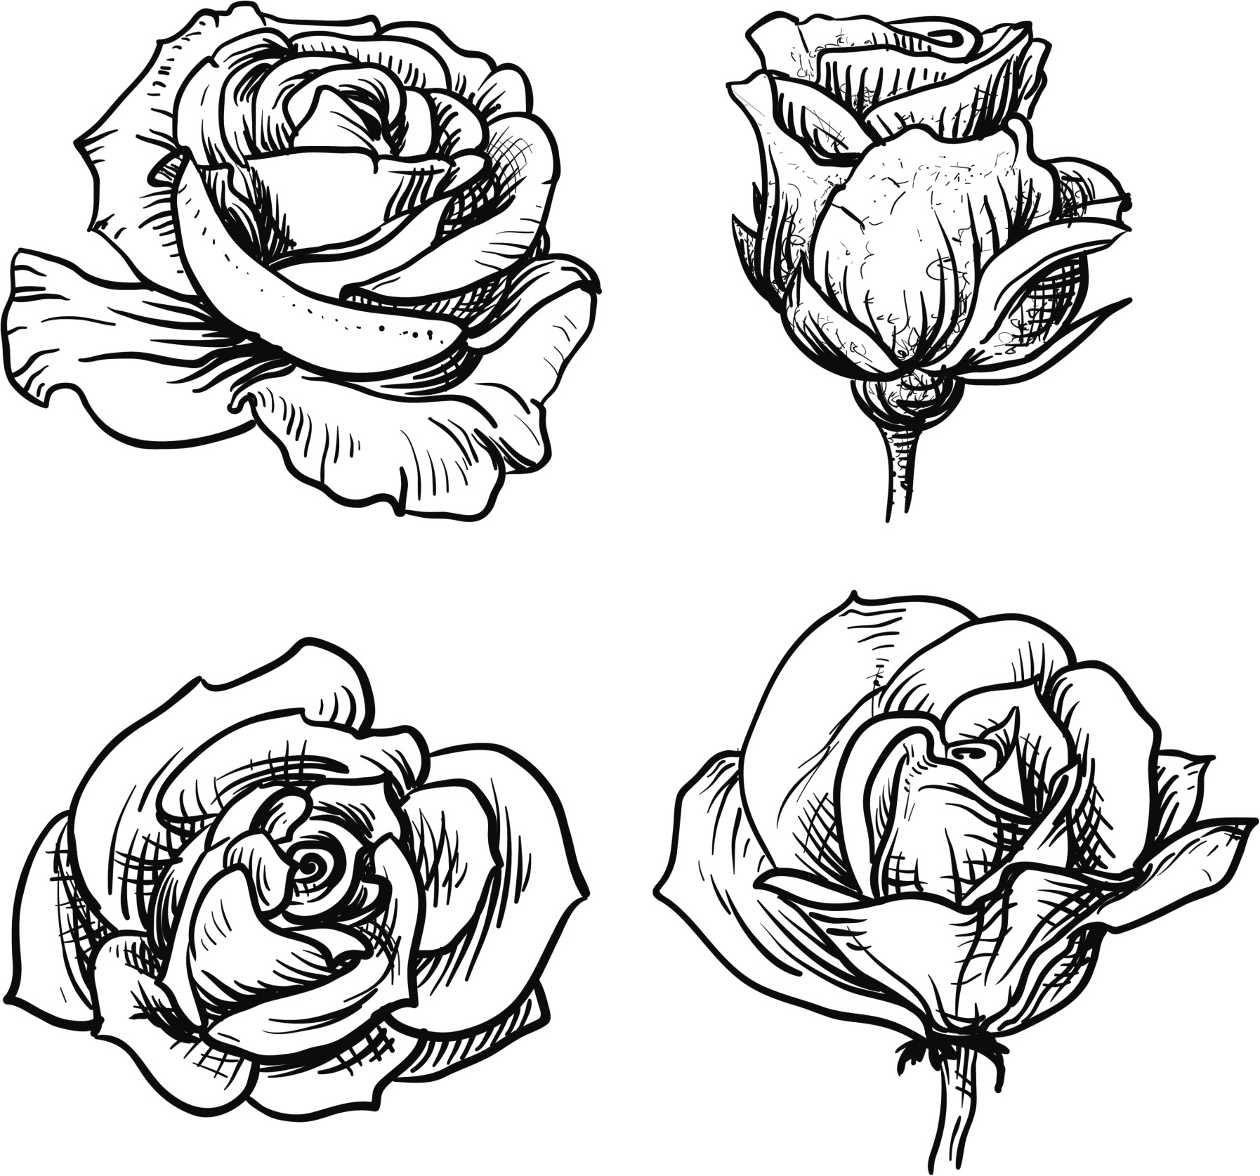 Flower Dibujo: Dibujos De Rosas Para Colorear